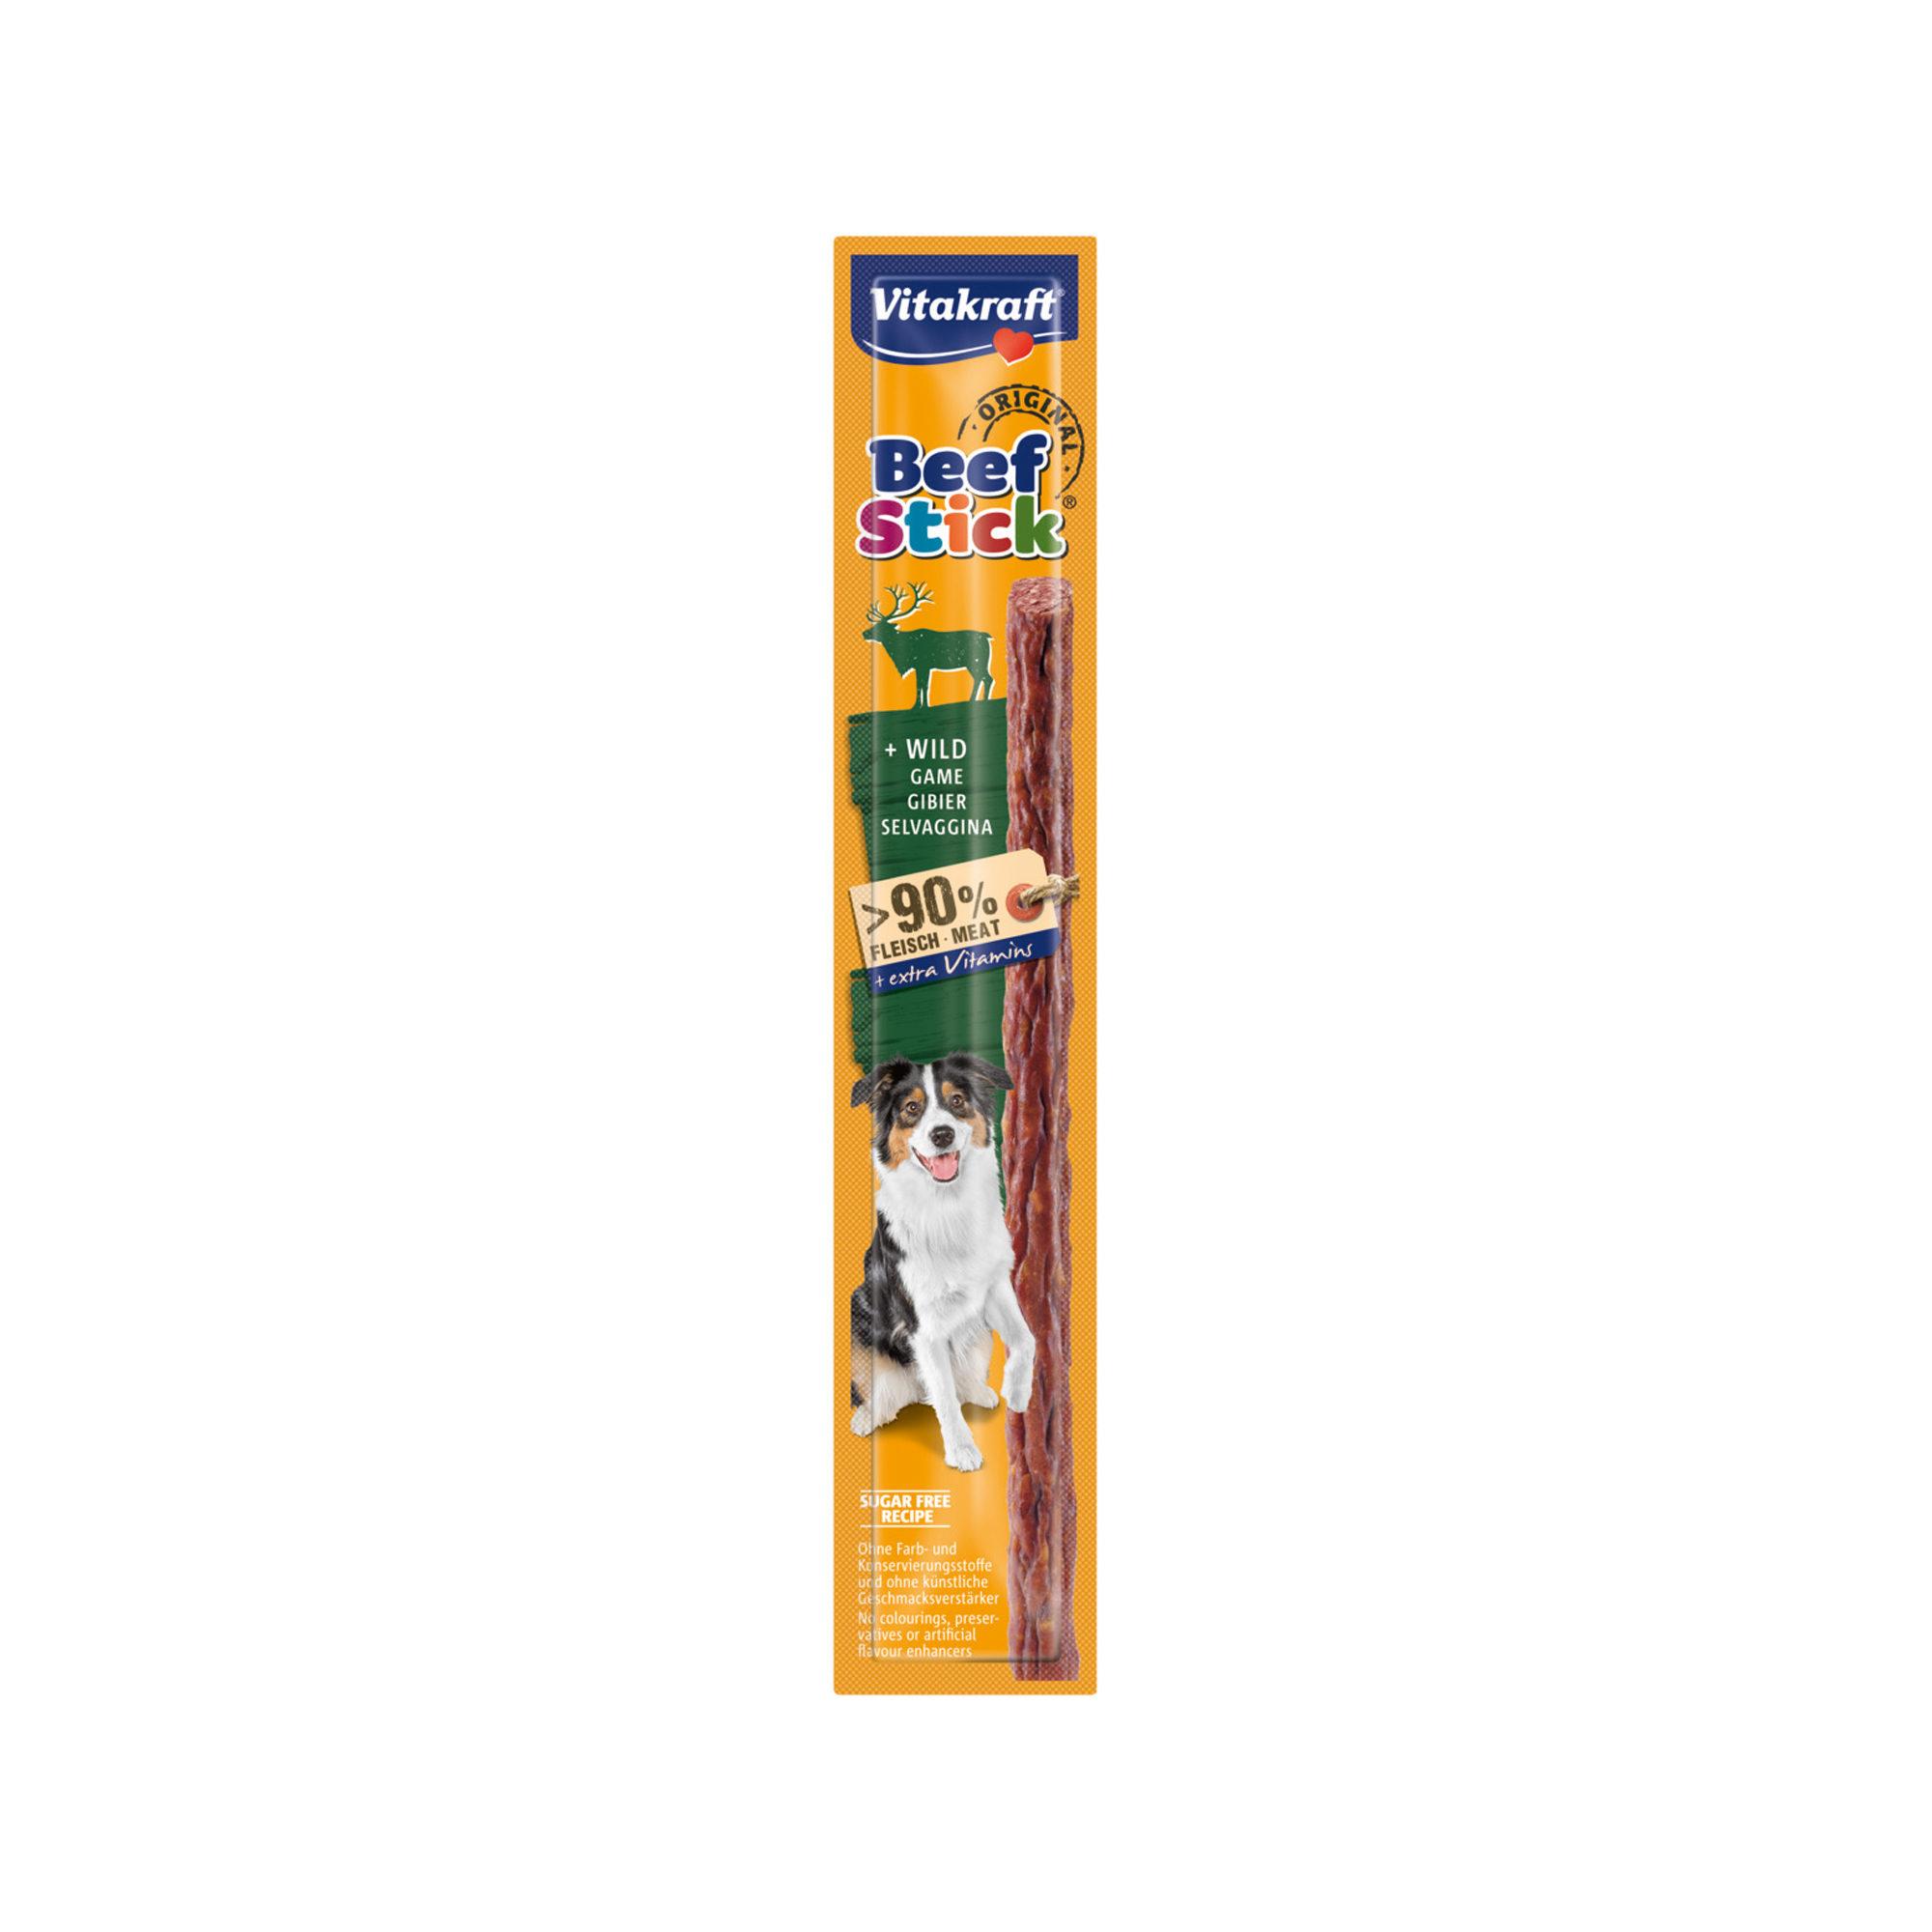 Vitakraft Beef Stick - Original Wild